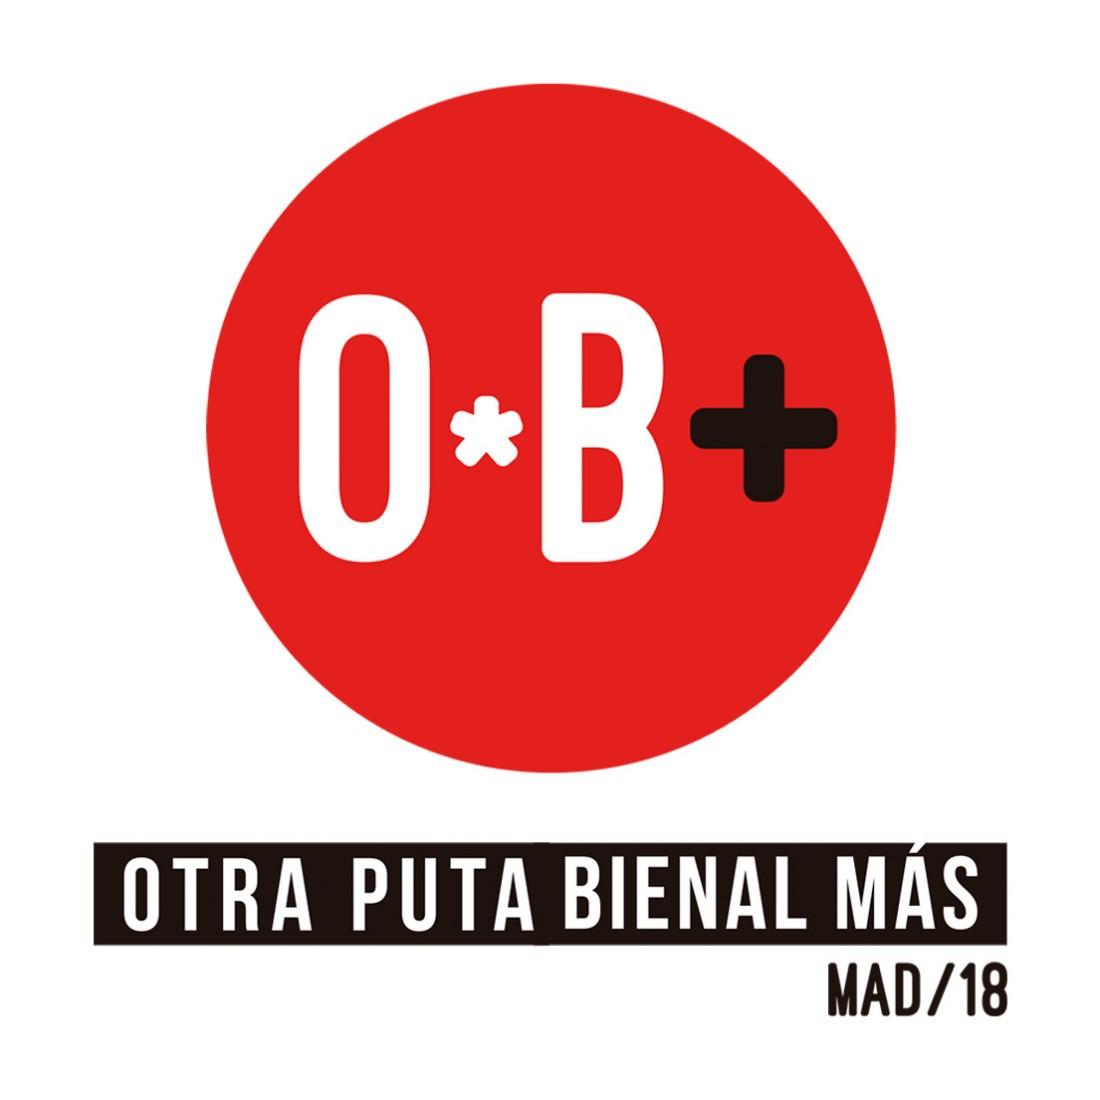 otra-puta-bienal-mas-julio-falagan-0